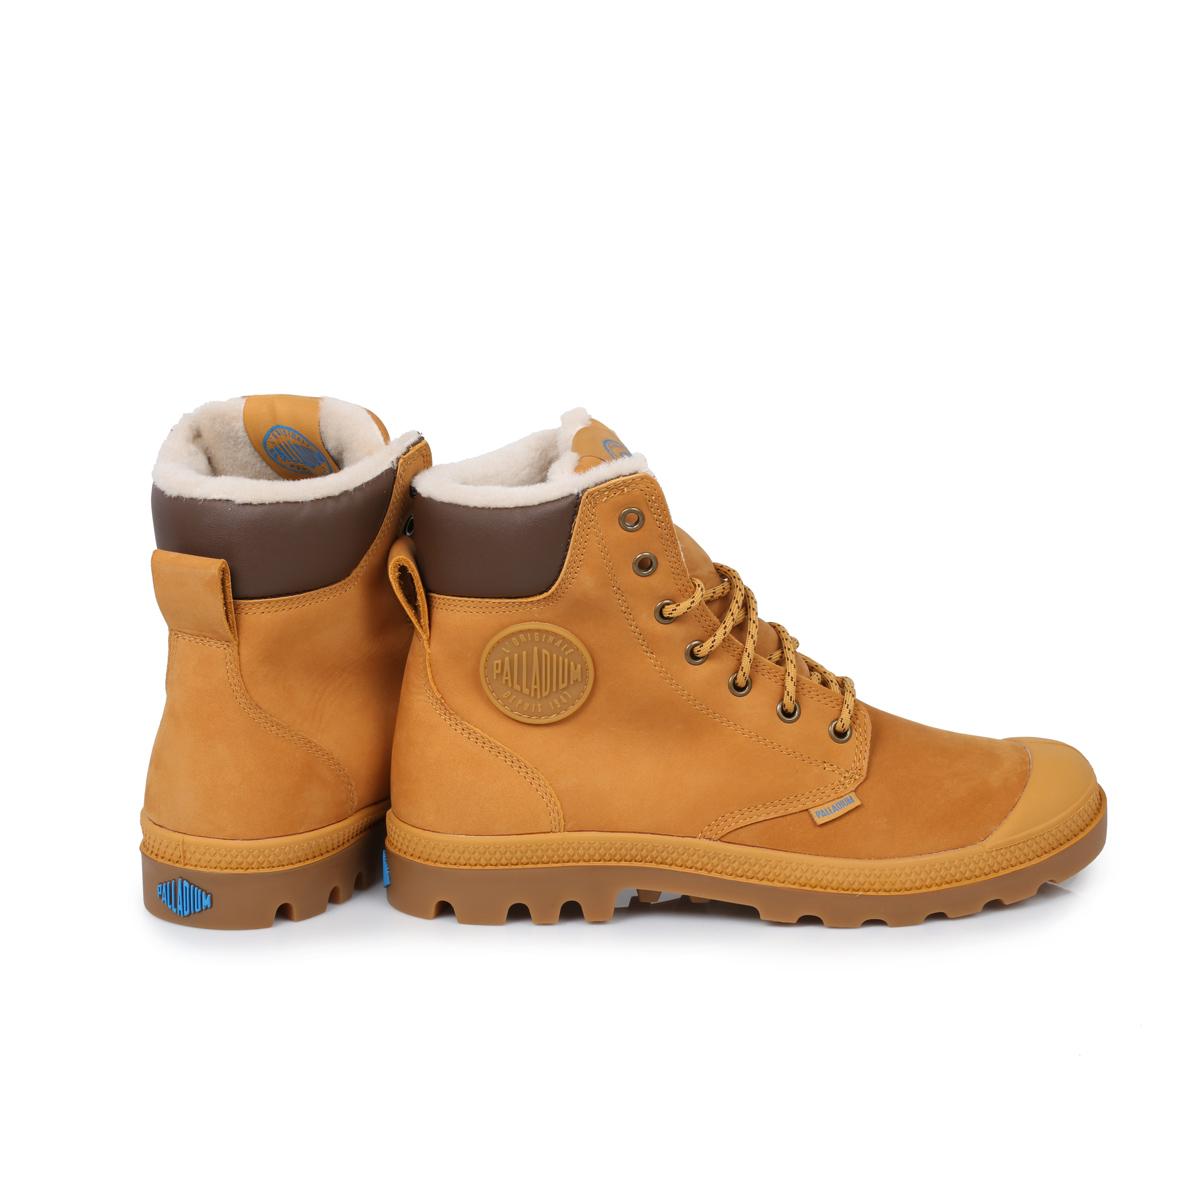 Luxury Amazon Palladium Boots Fashion | Palladium Baggy Low Lp Originals Boots White/Moonbeam ...